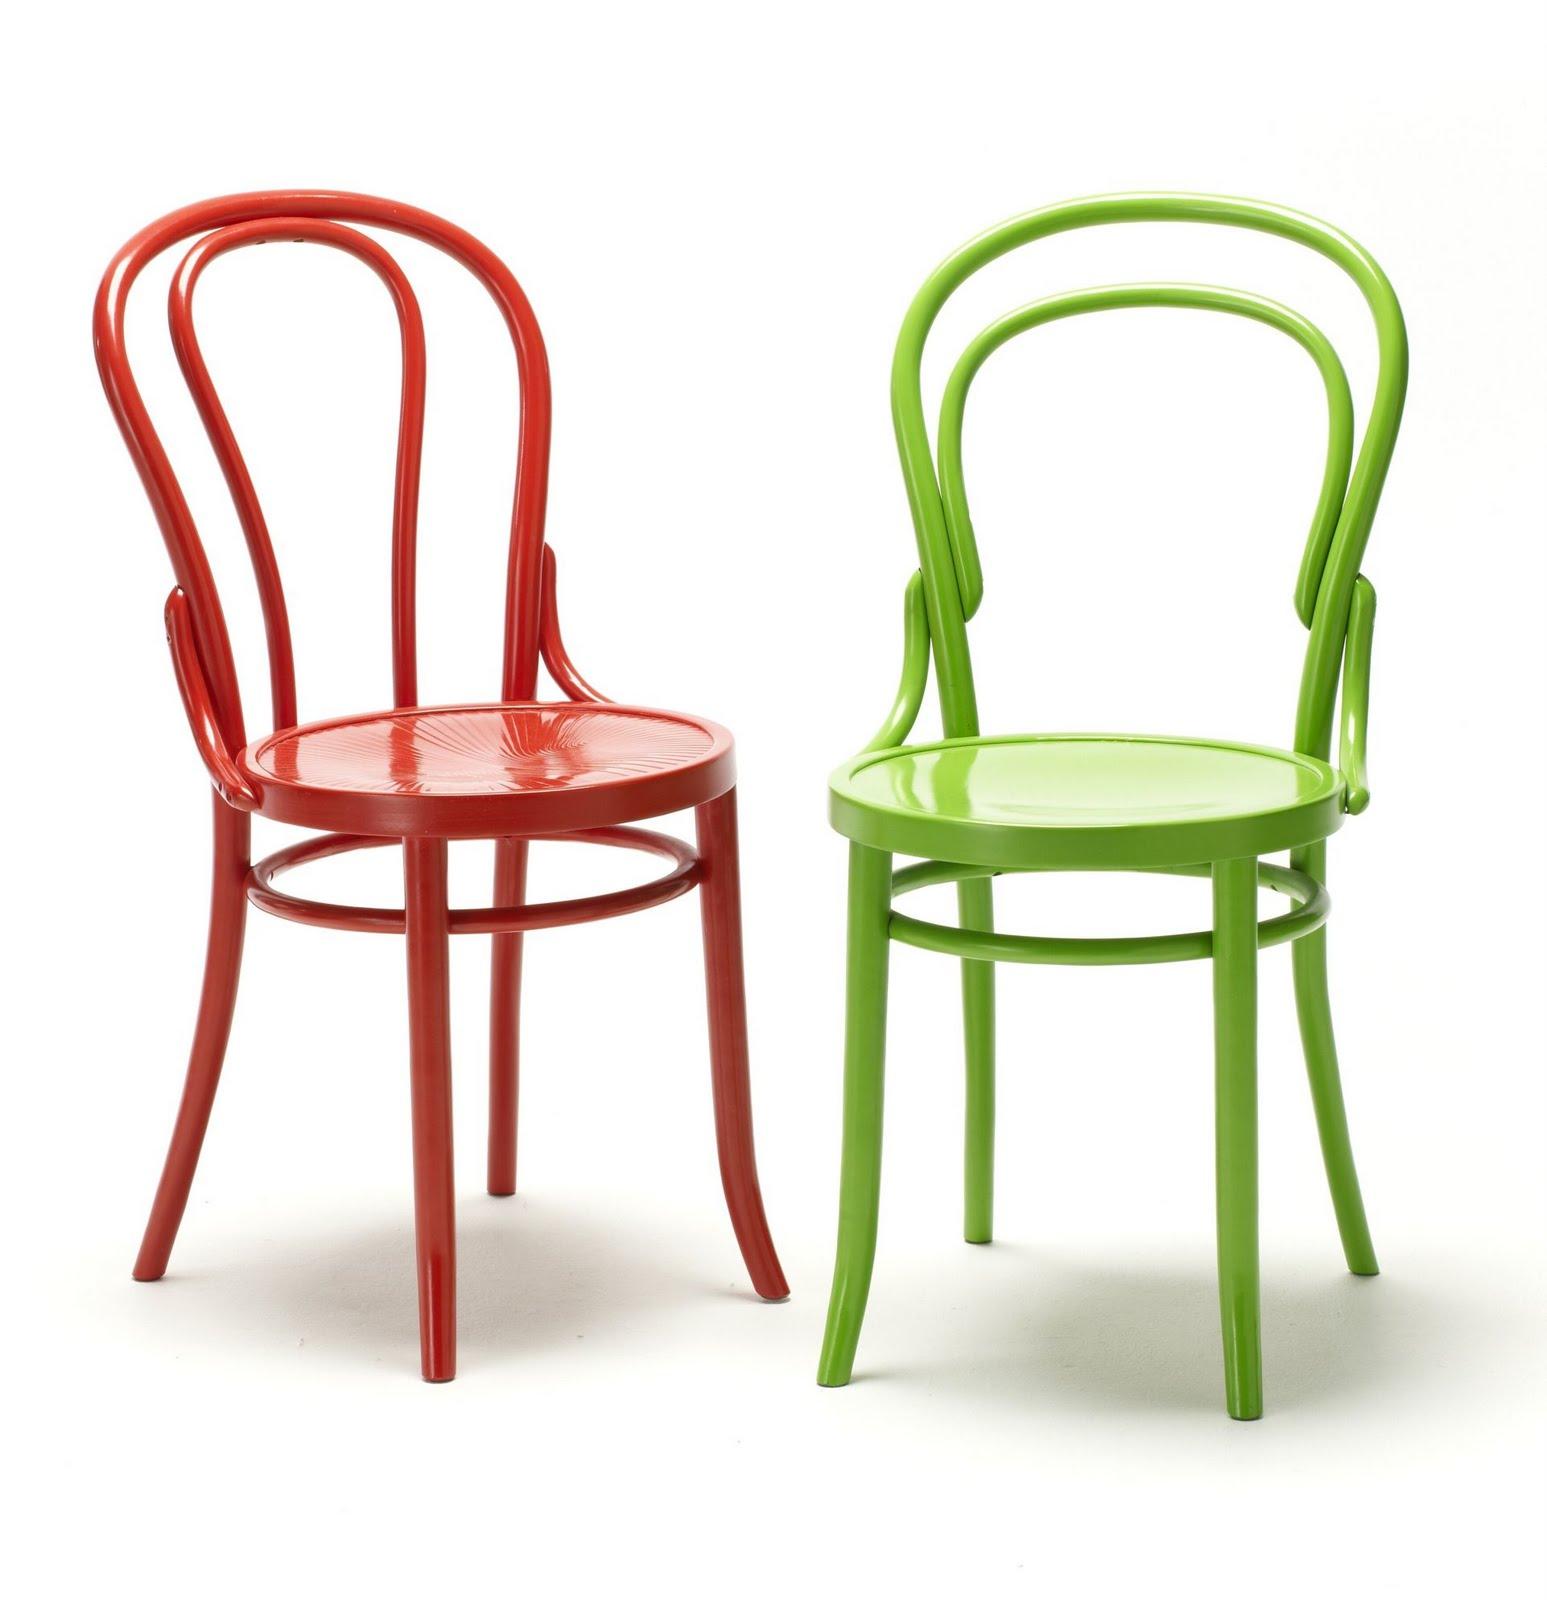 Kitchen Chairs Swing Chair Range Bentwood